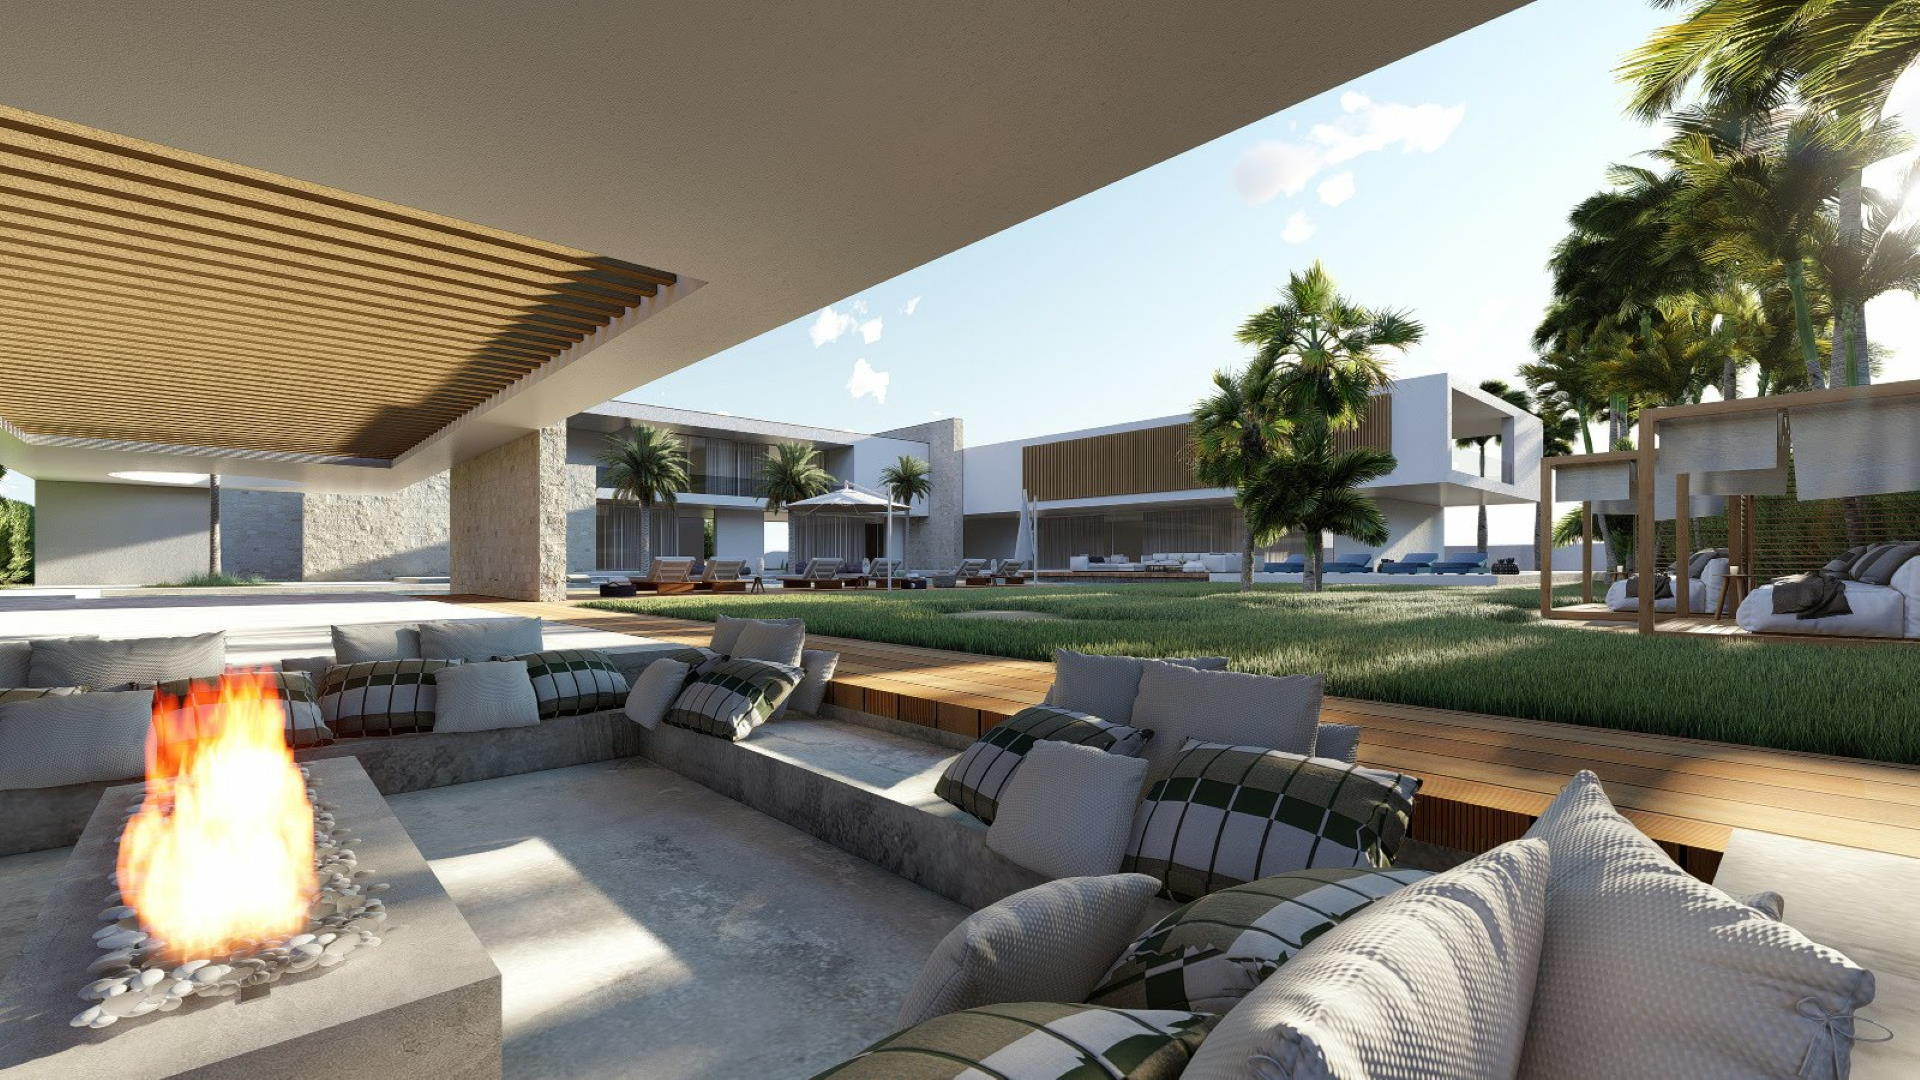 Noon Architecture